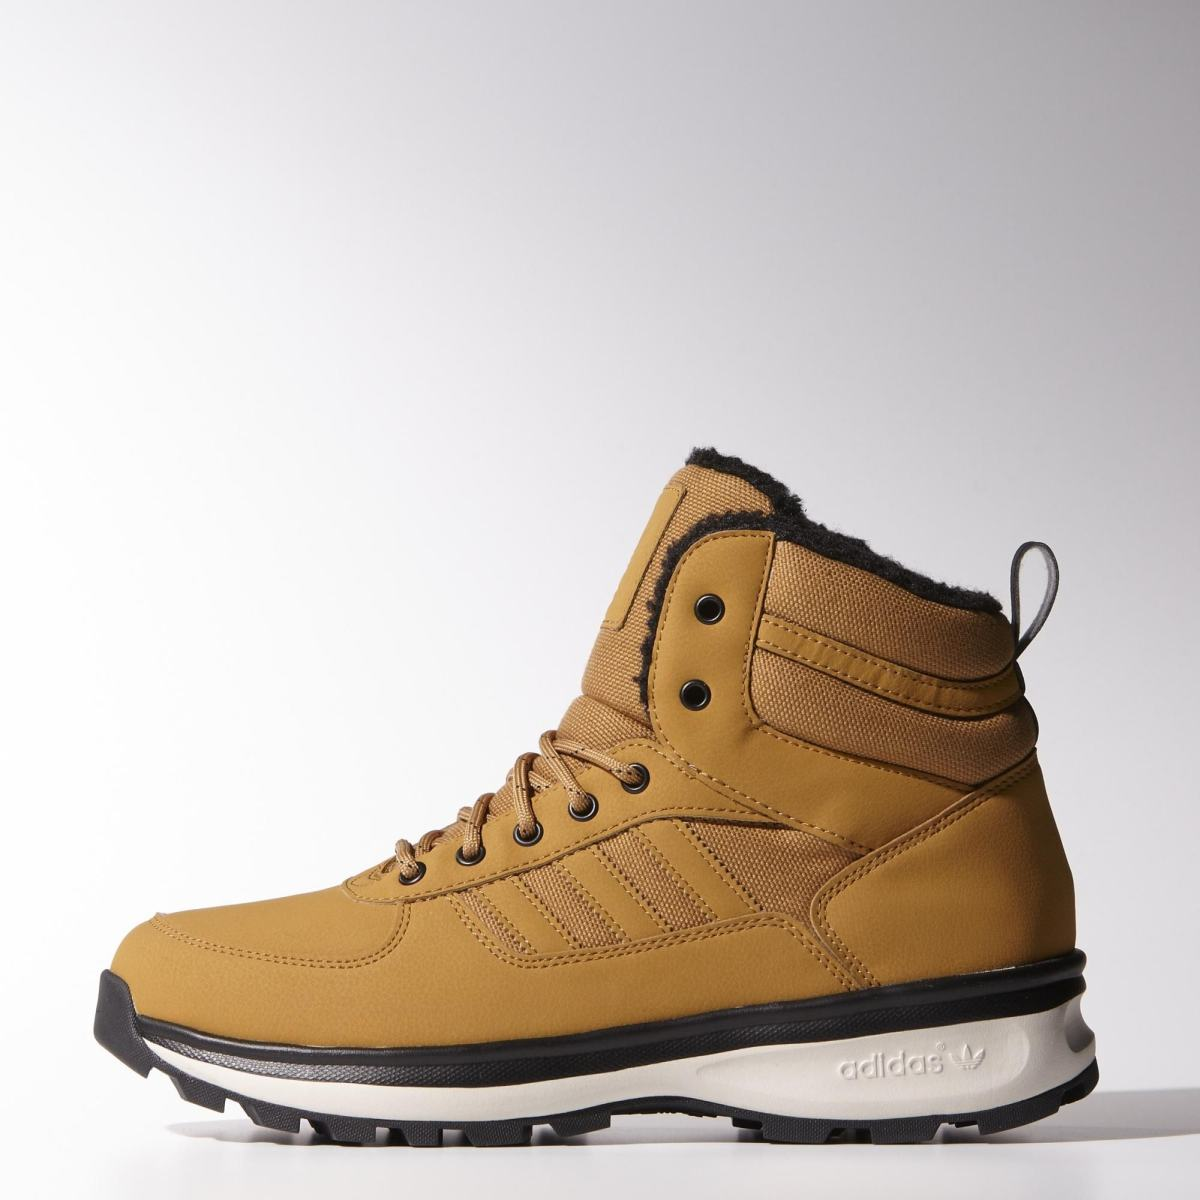 a1d1a6b27e Pánske zimné topánky a tenisky Adidas 2014 2015